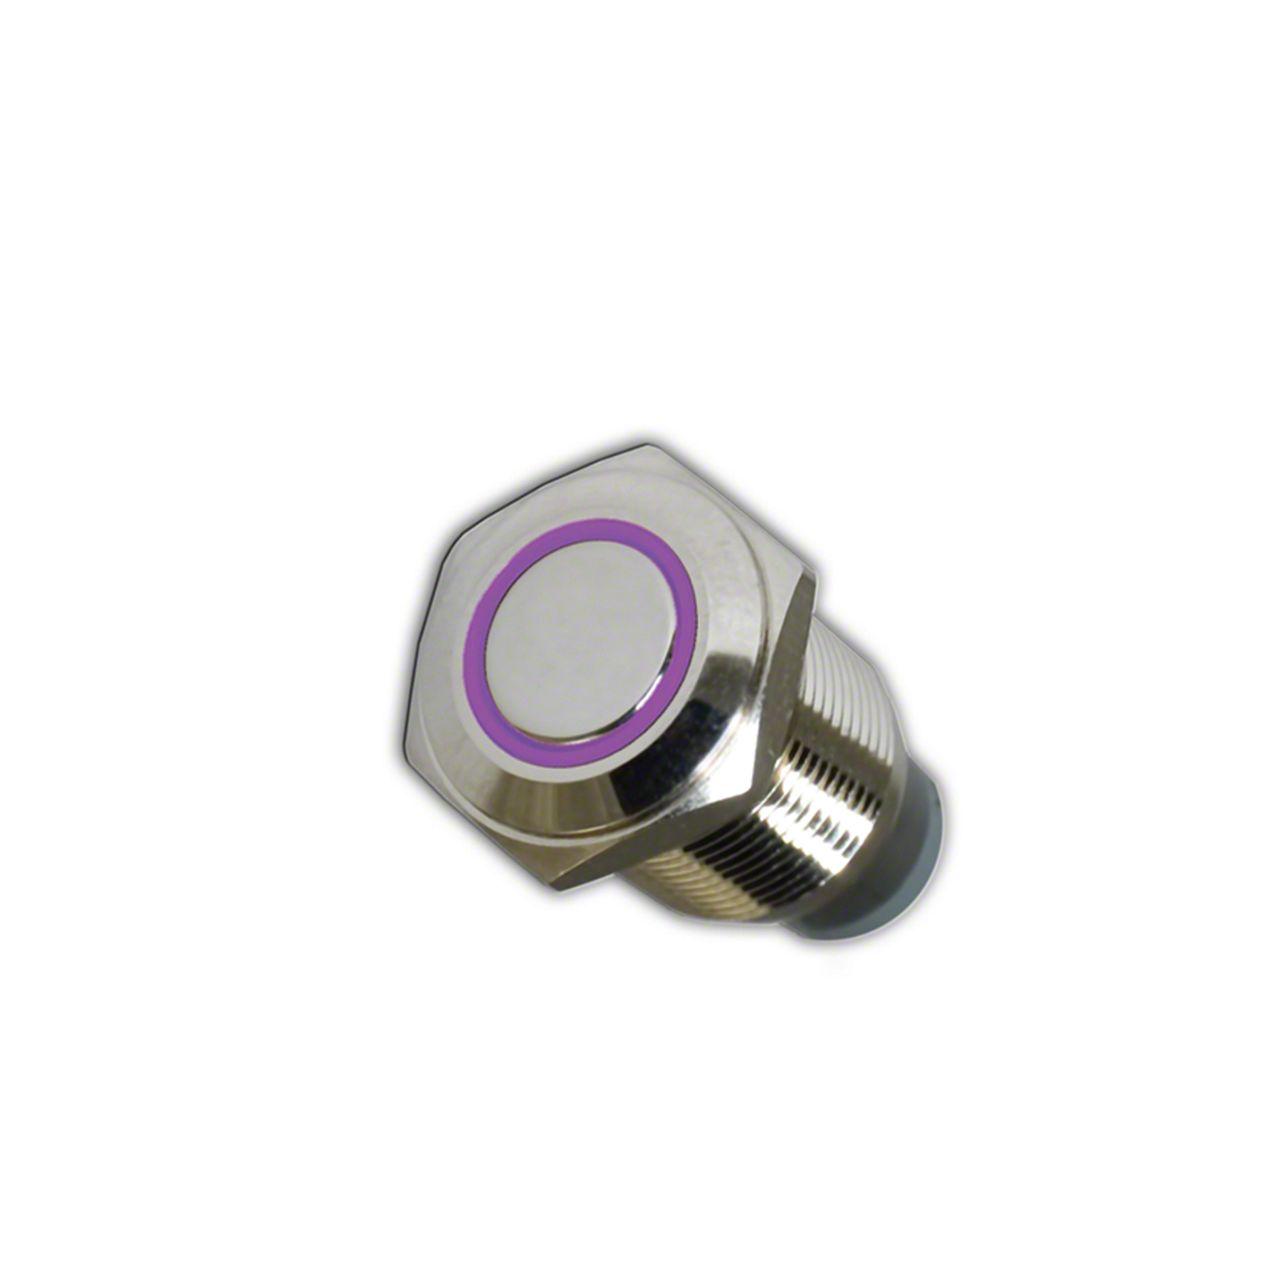 Oracle On/Off Flush Mount LED Switch - UV/Purple (07-18 Sierra 1500)